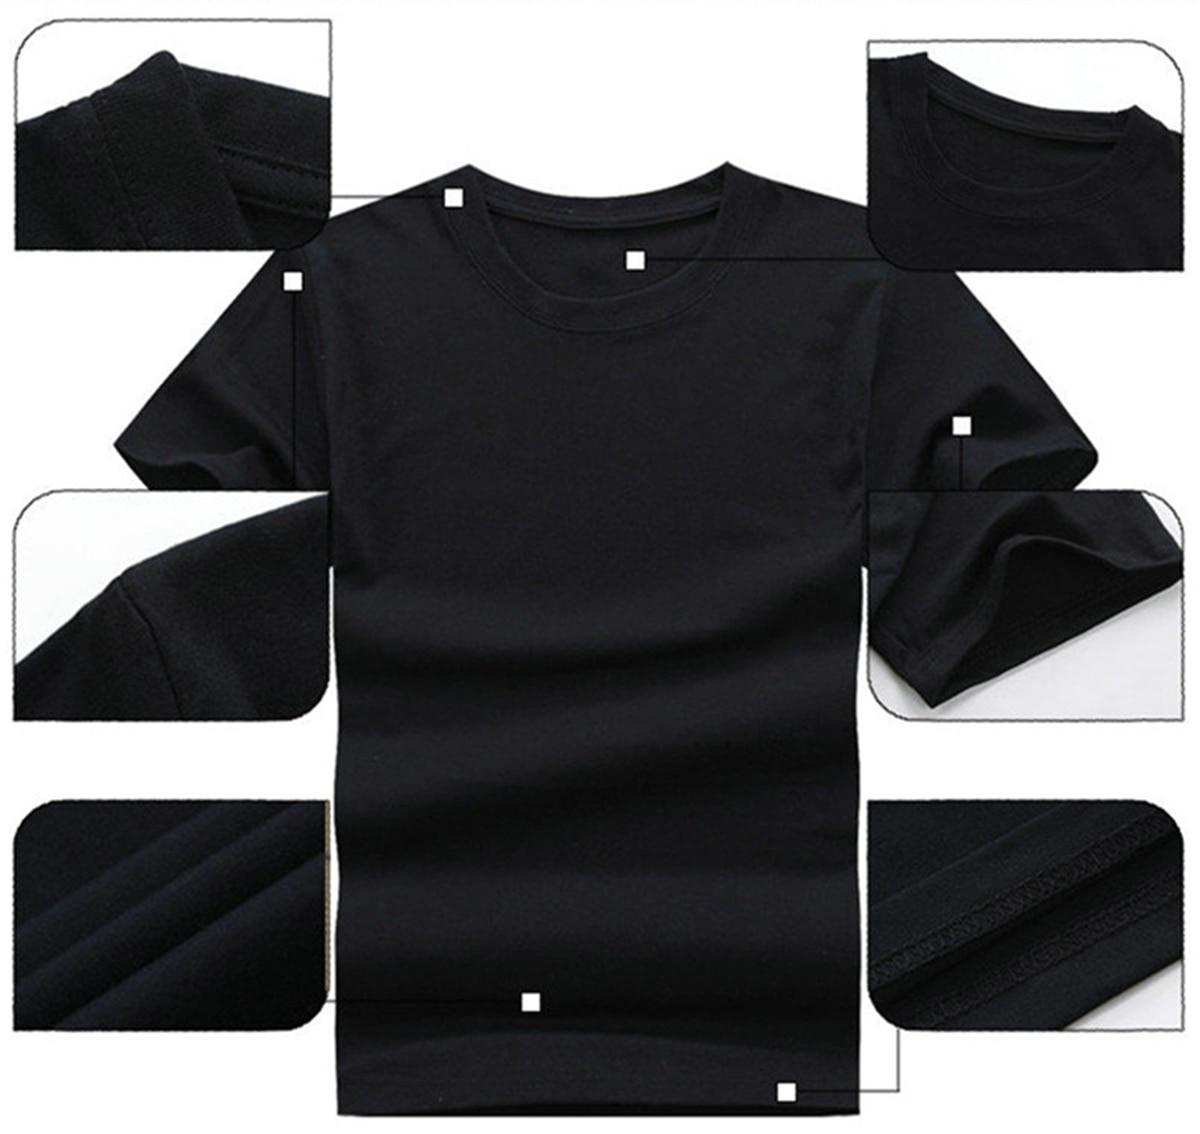 GILDAN Real Estate Agent T-Shirt - Everything I Touch Turns To Sold Gildan T-shirt Cotton Short Sleeve Top Dress female T-shirt